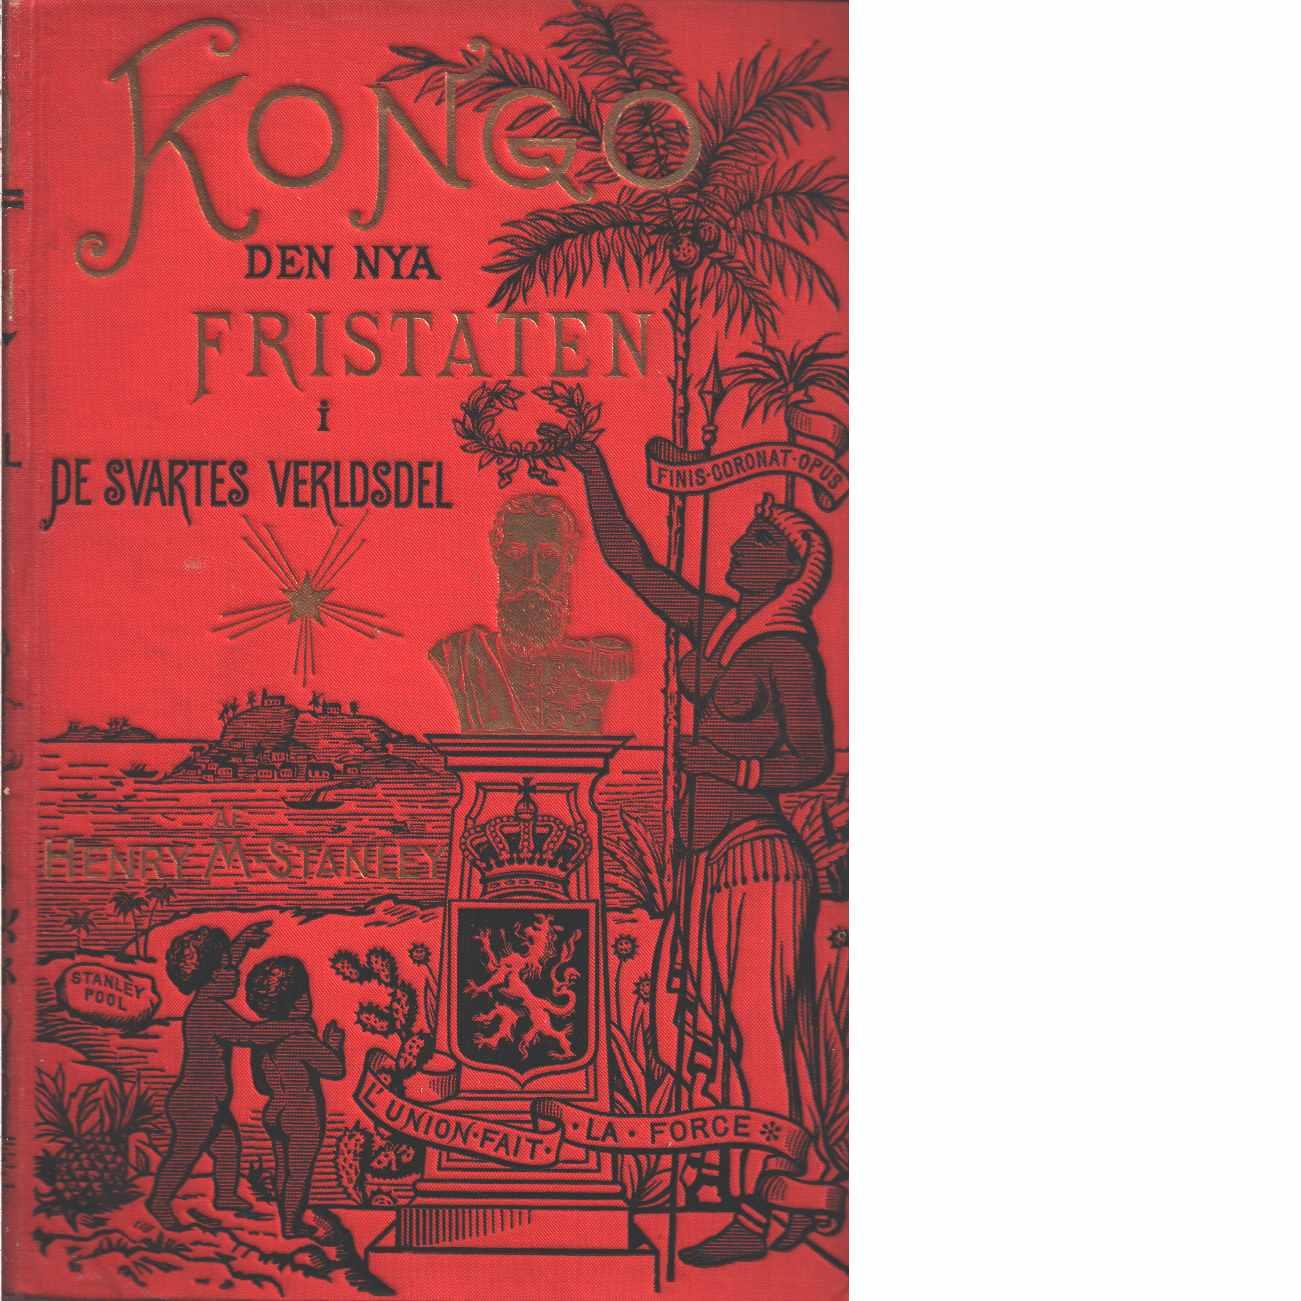 Kongo den nya fristaten i de svartes verldsdel [del I och II] - Stanley, M. Stanley